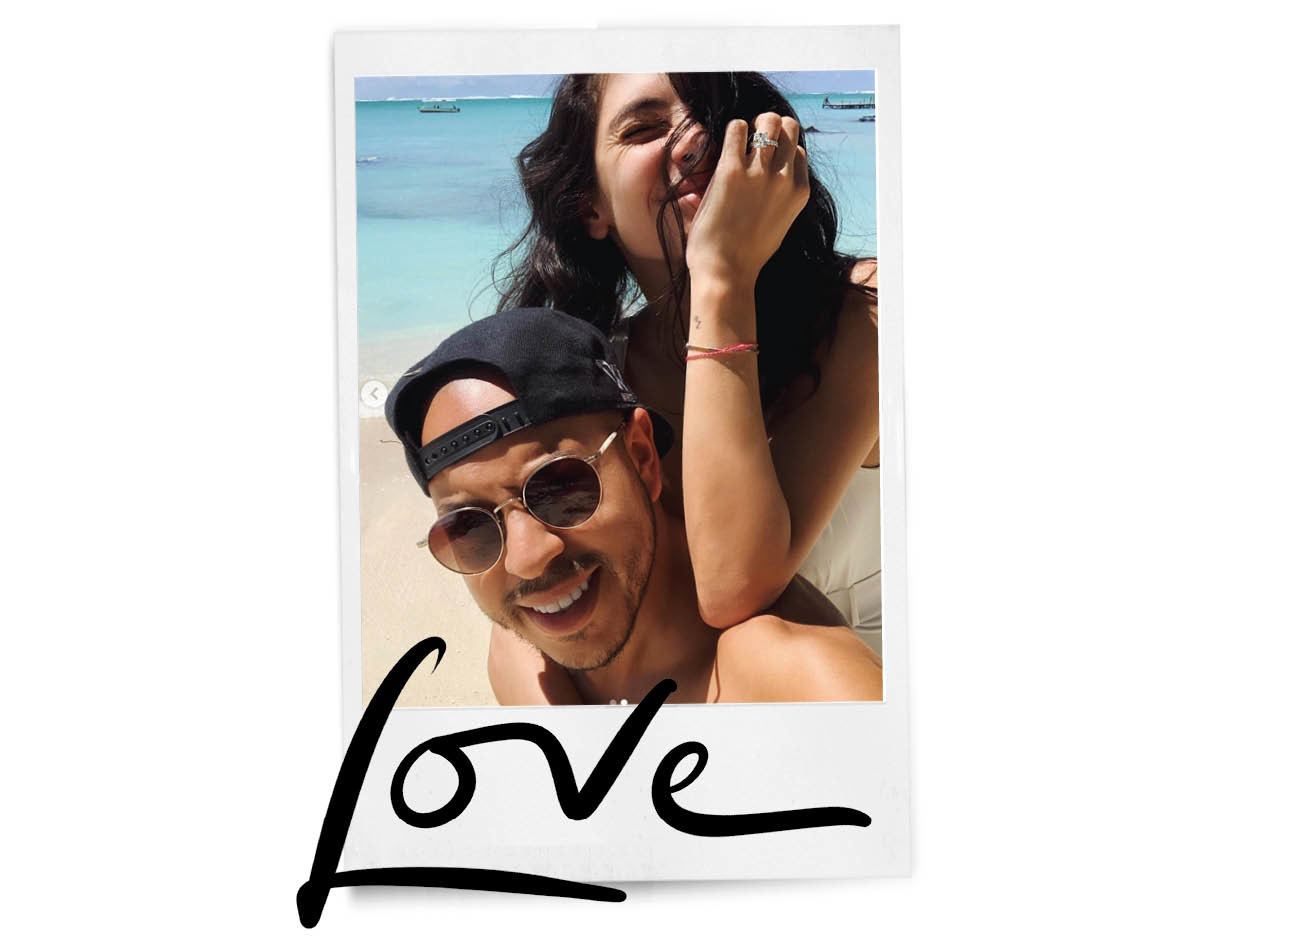 anna nooshin en sirzeta trouwen lachend op strand